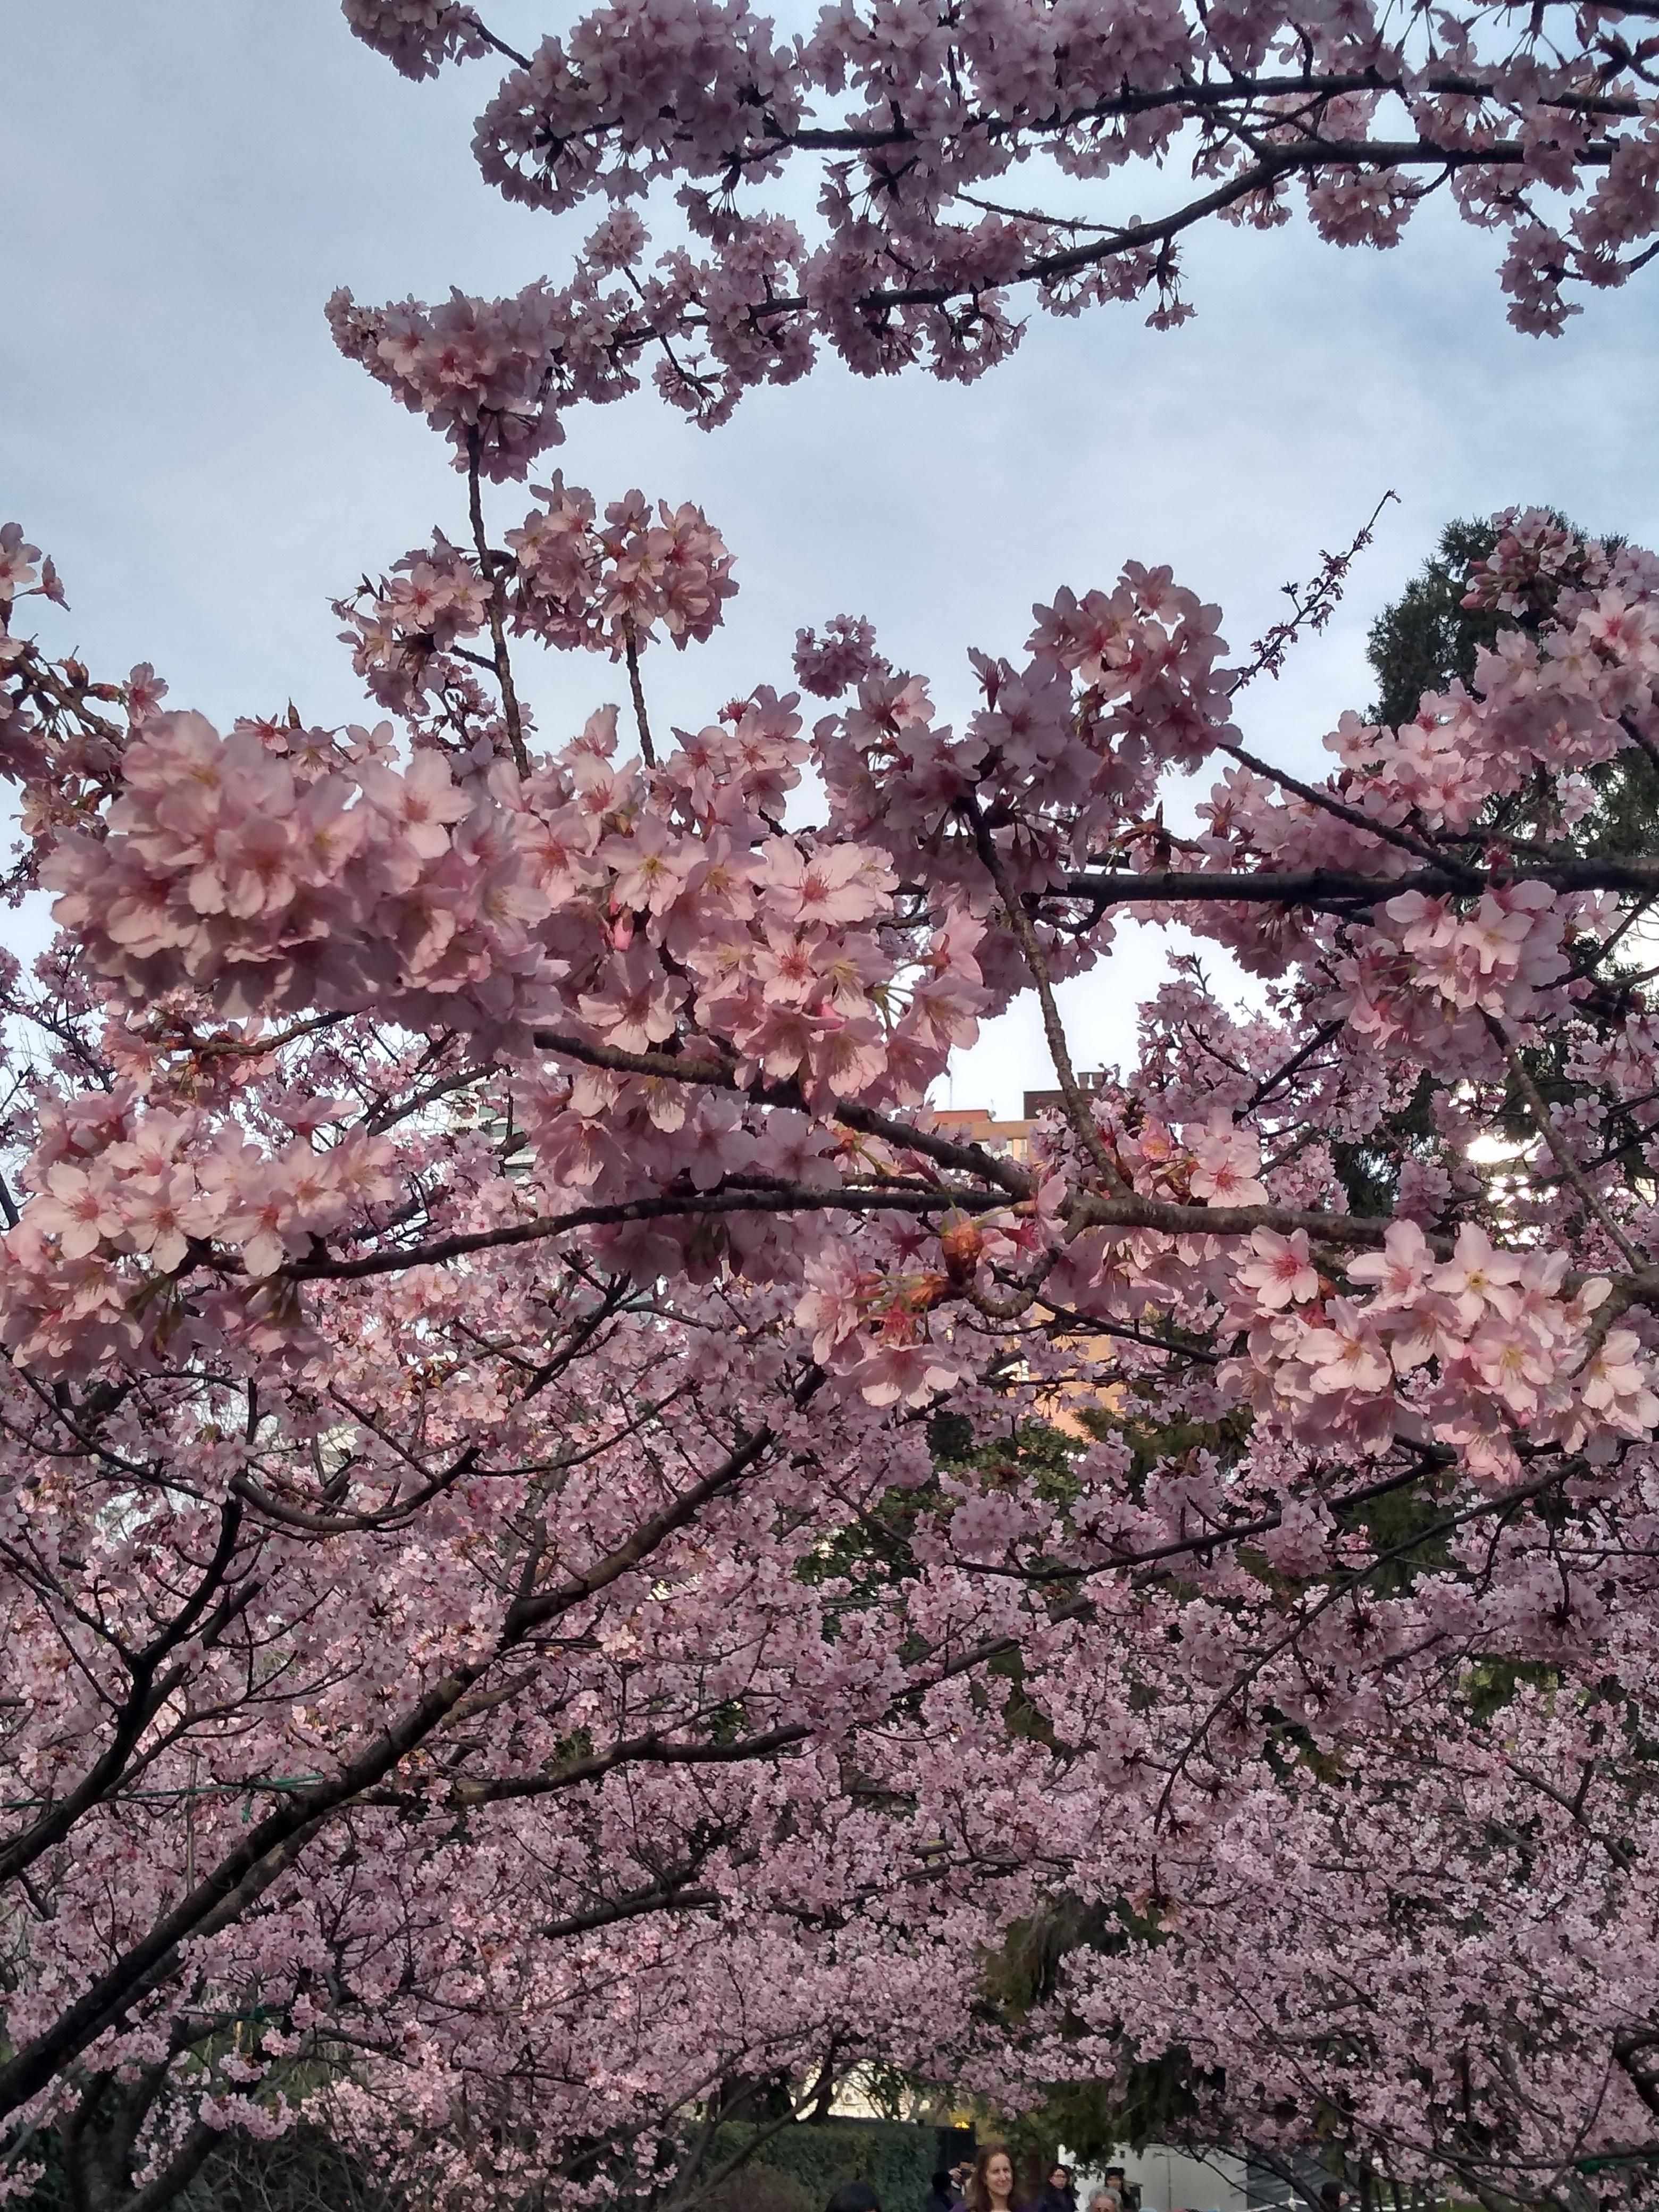 Sakura Cherry Trees Blooming In The Japanese Garden Argentina Gardening Garden Diy Home Flowers Roses Nature L Japanese Garden Sakura Tree Cherry Tree